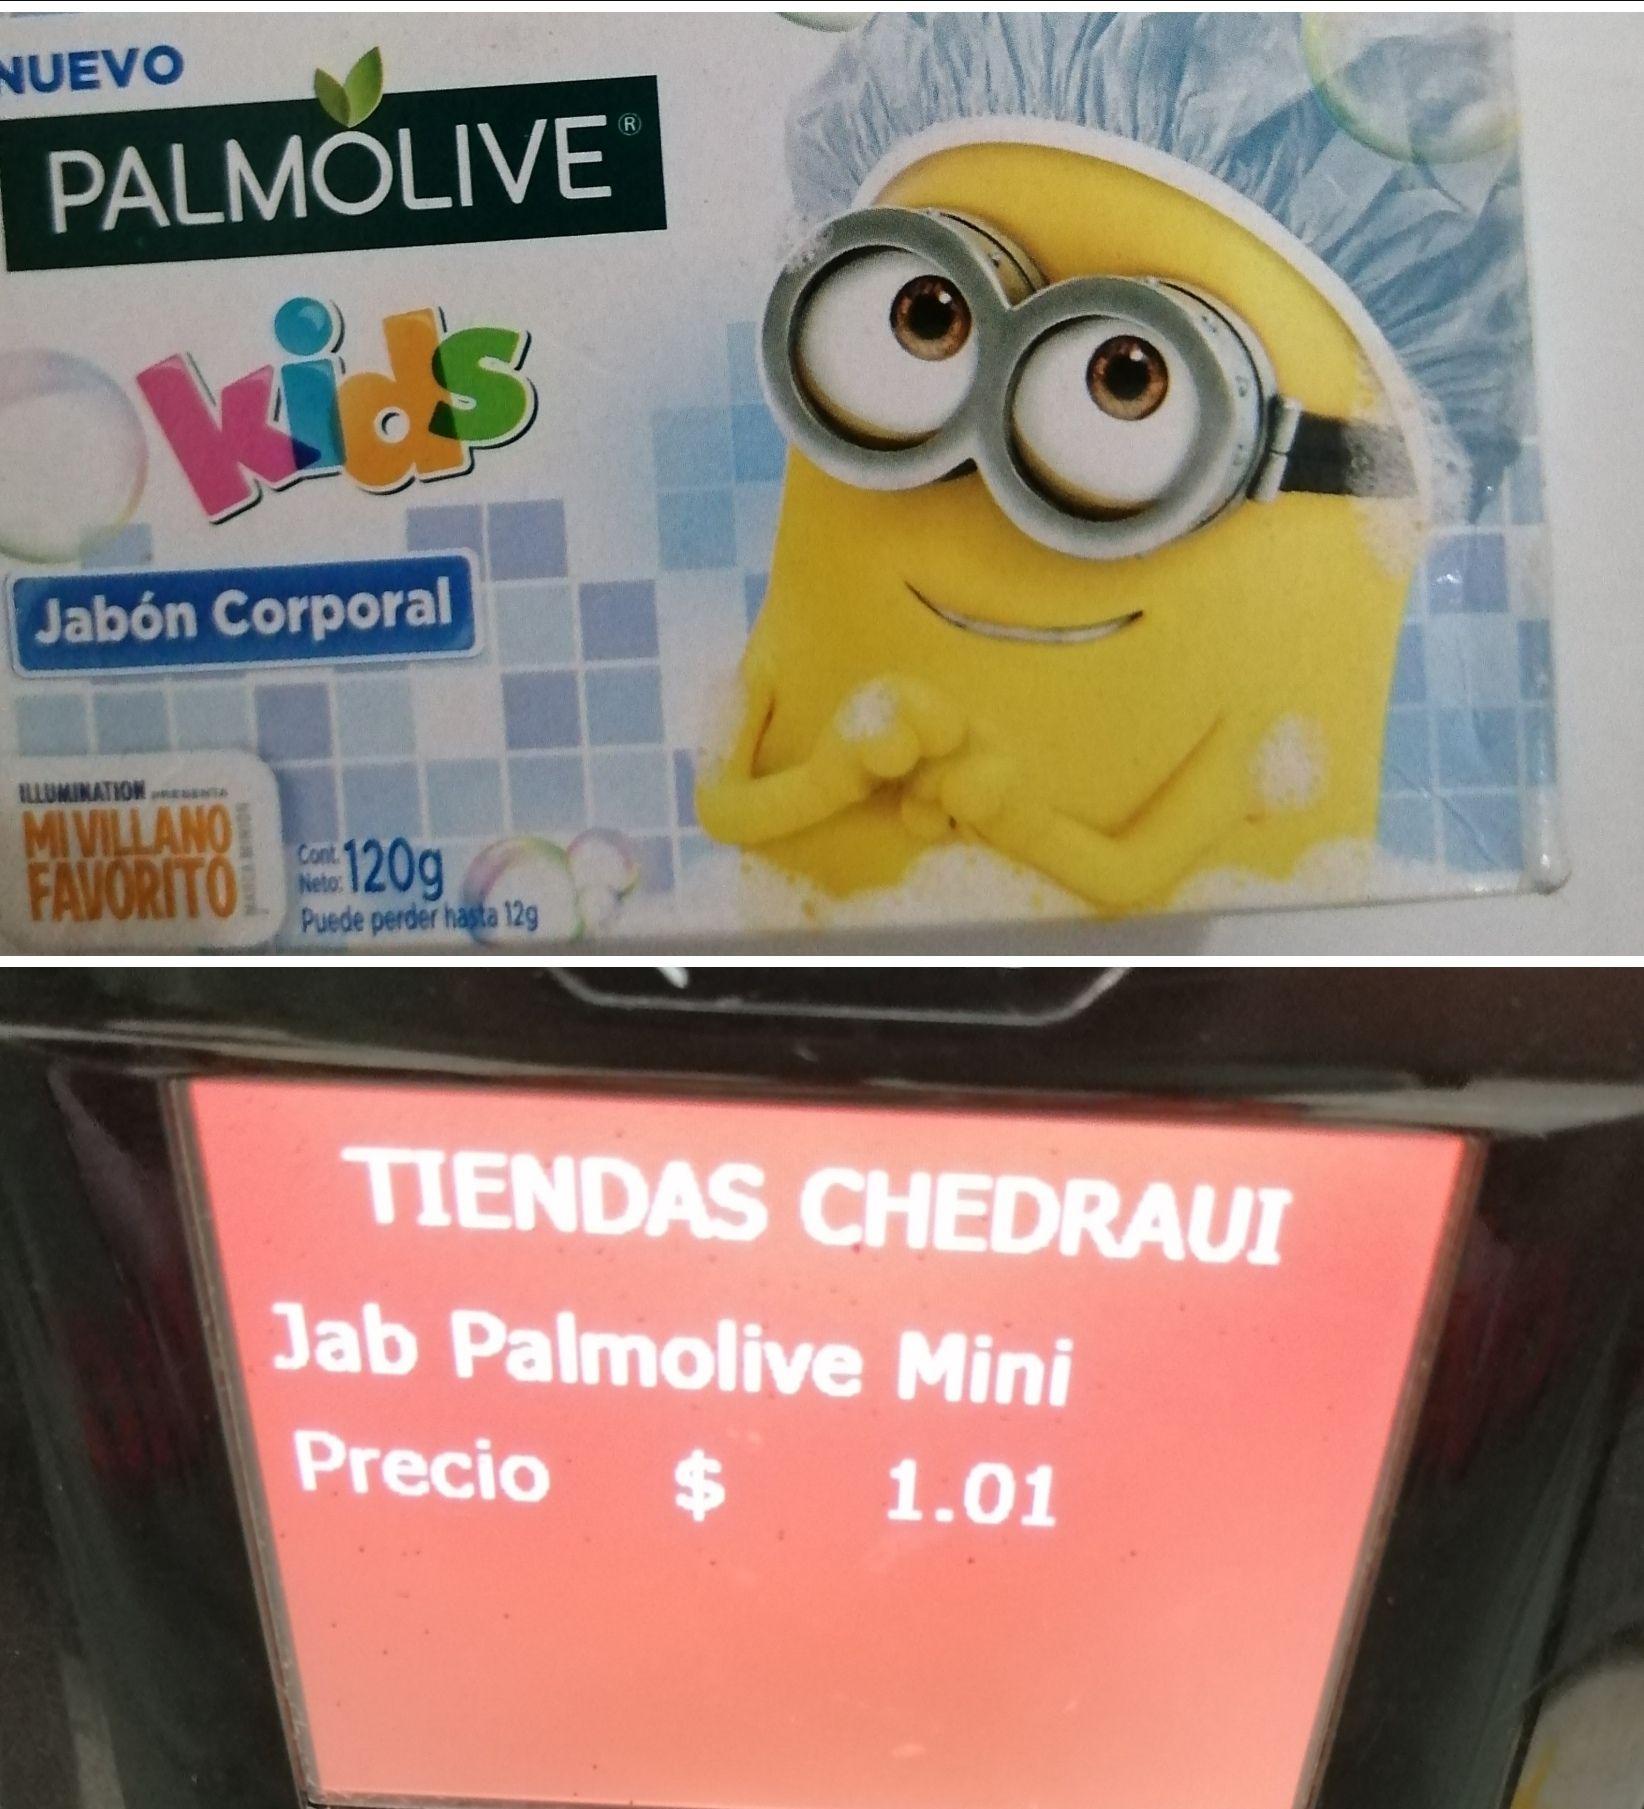 Chedraui: Jabón palmolive